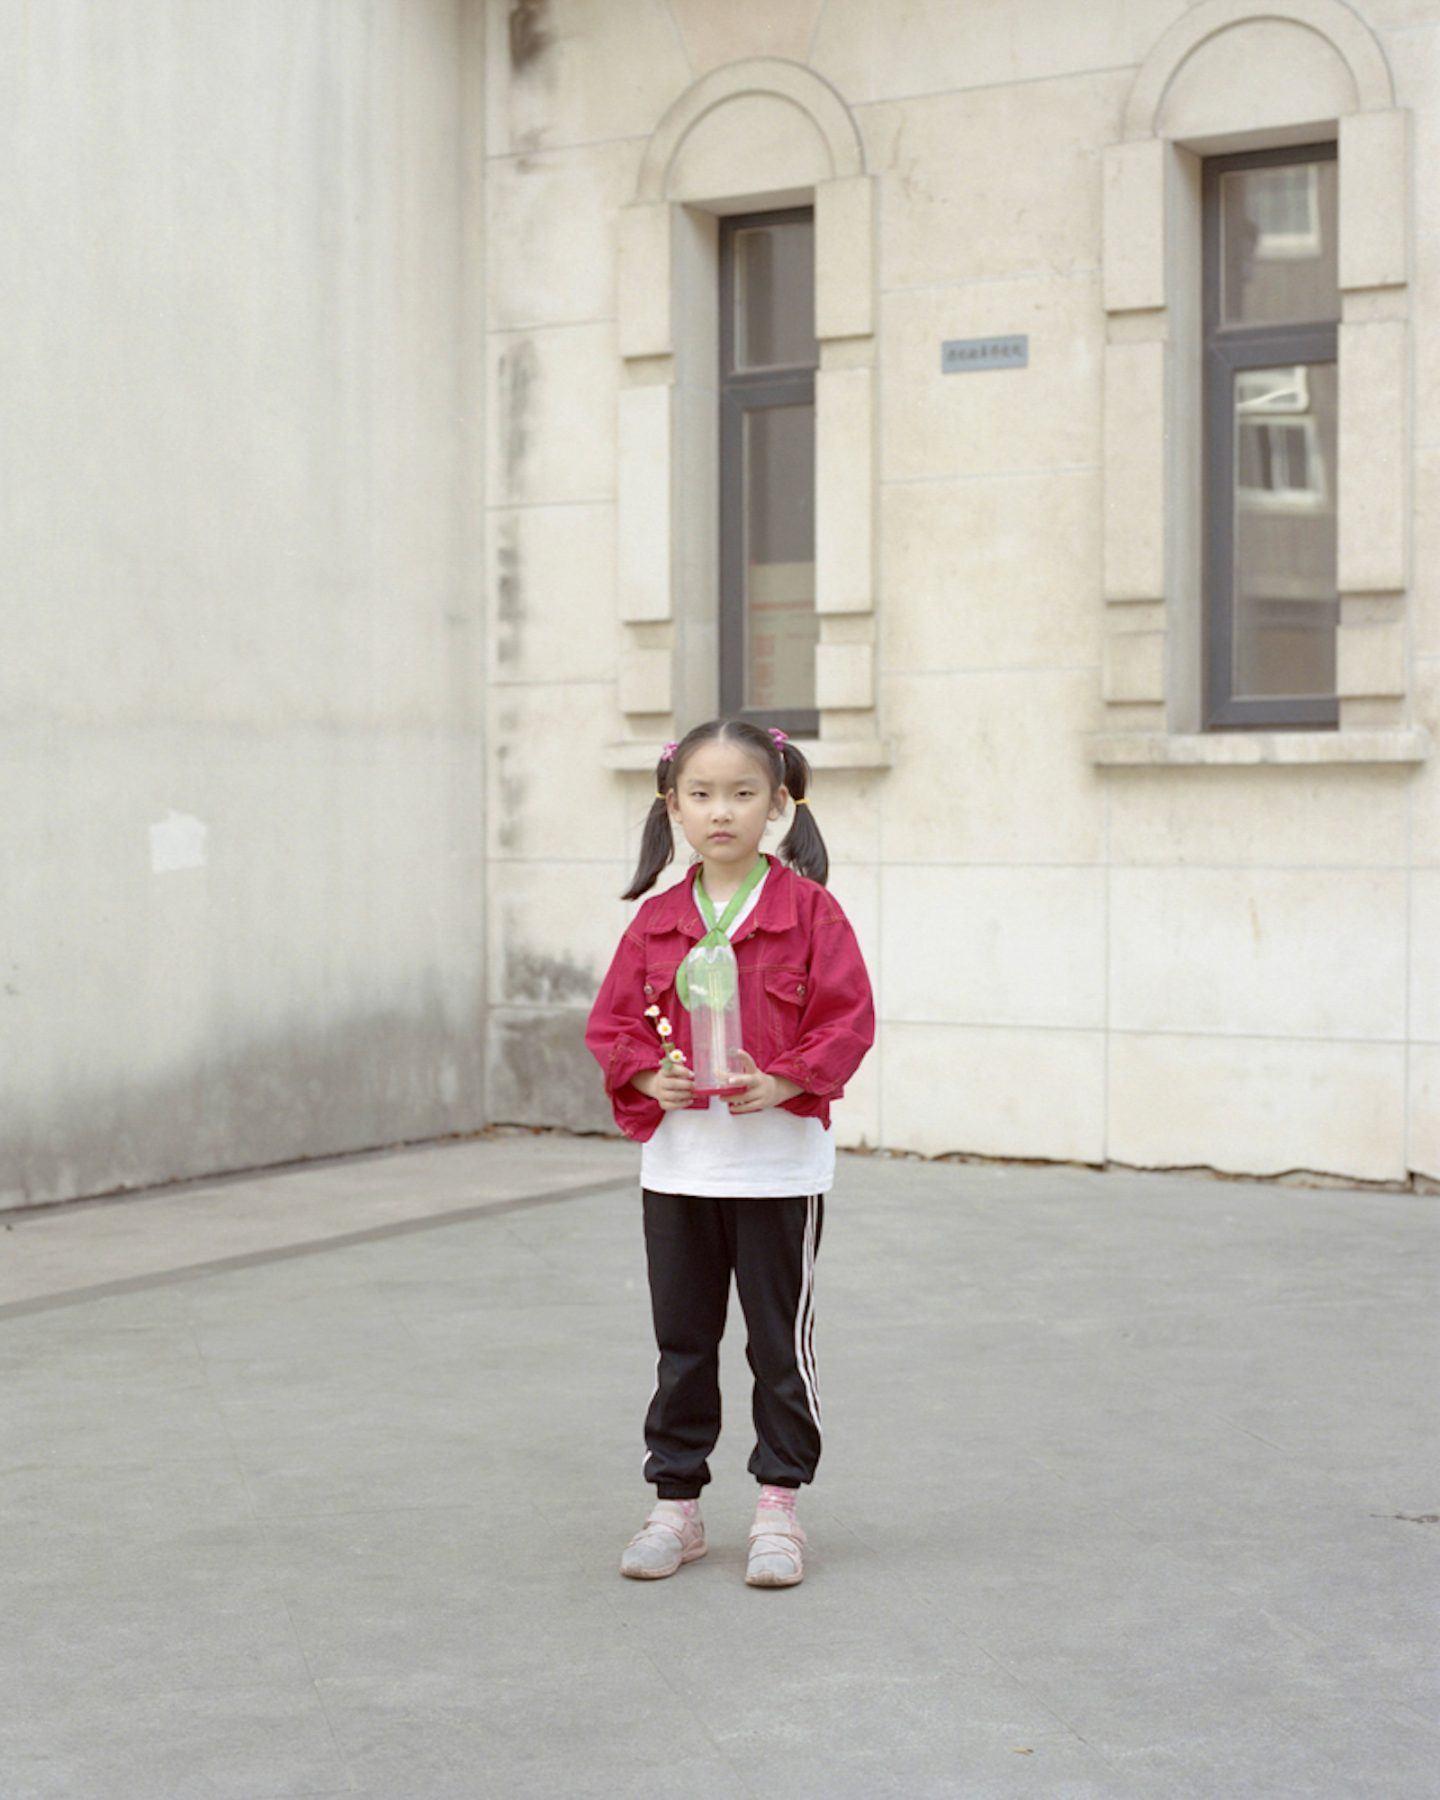 IGNANT-Photography-Cian-ObaSmith-Shanzhai-008